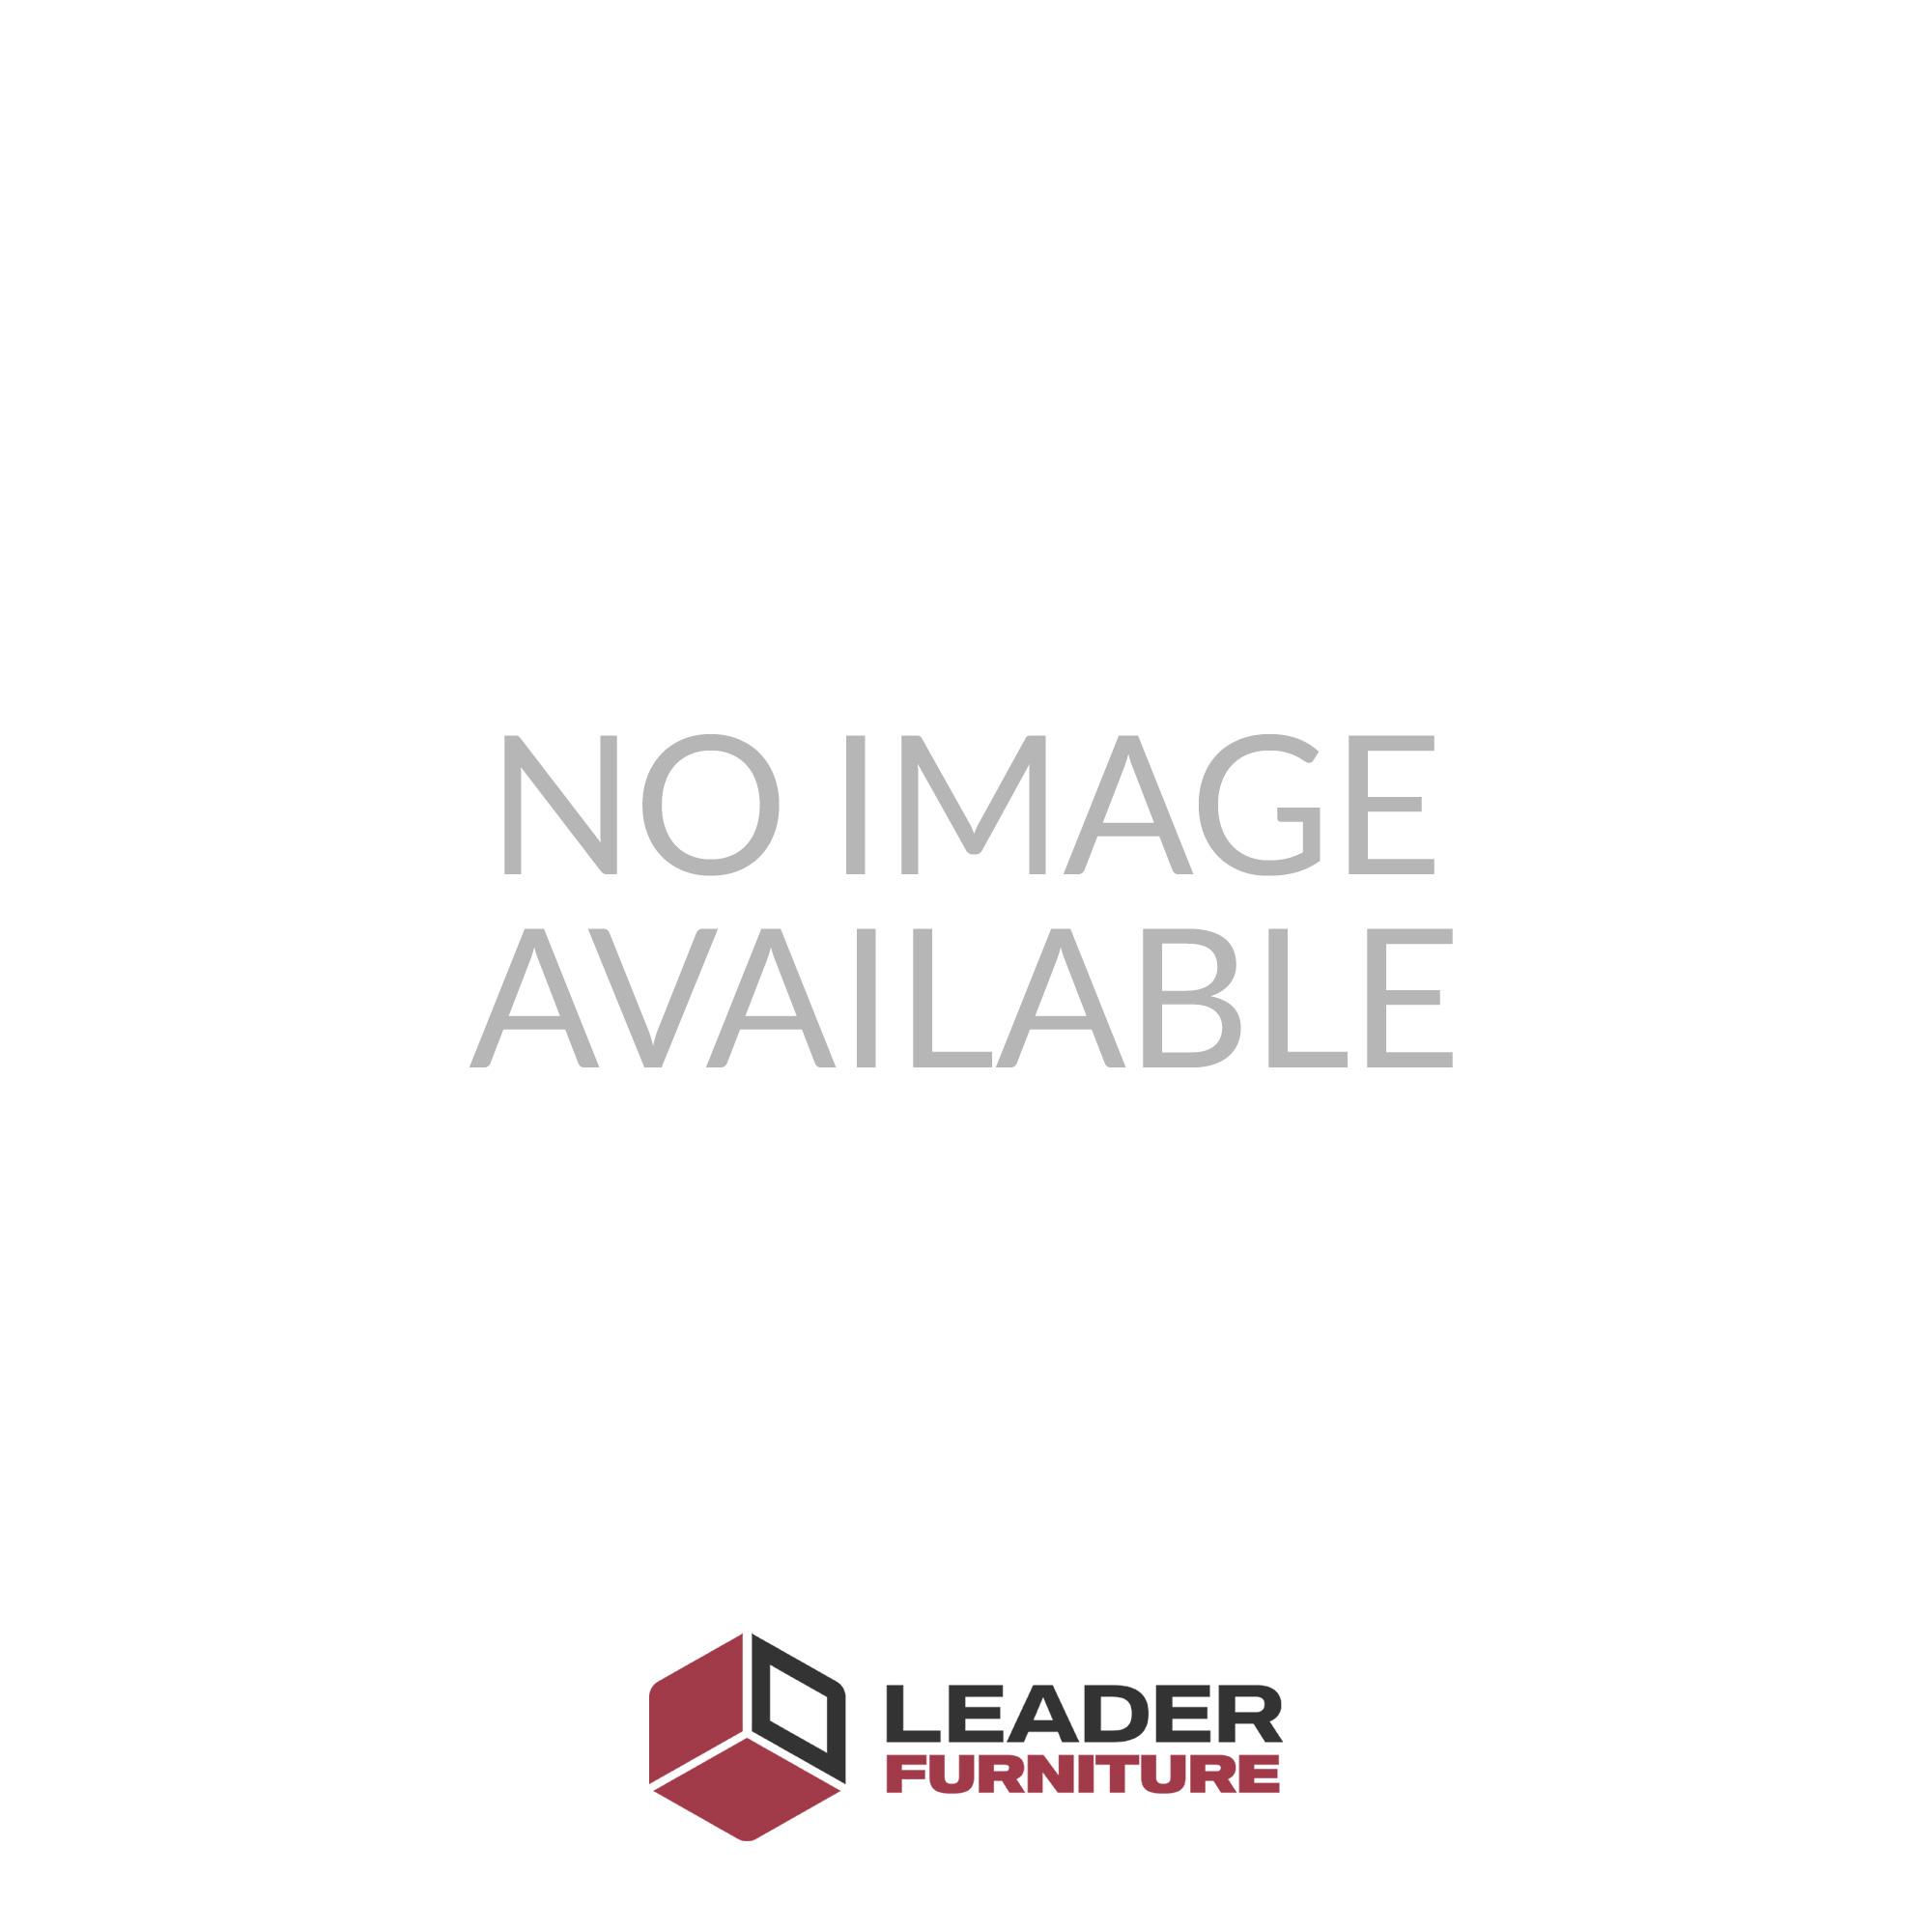 Supergloss Extra Sensitive Arctic White Laminate Flooring